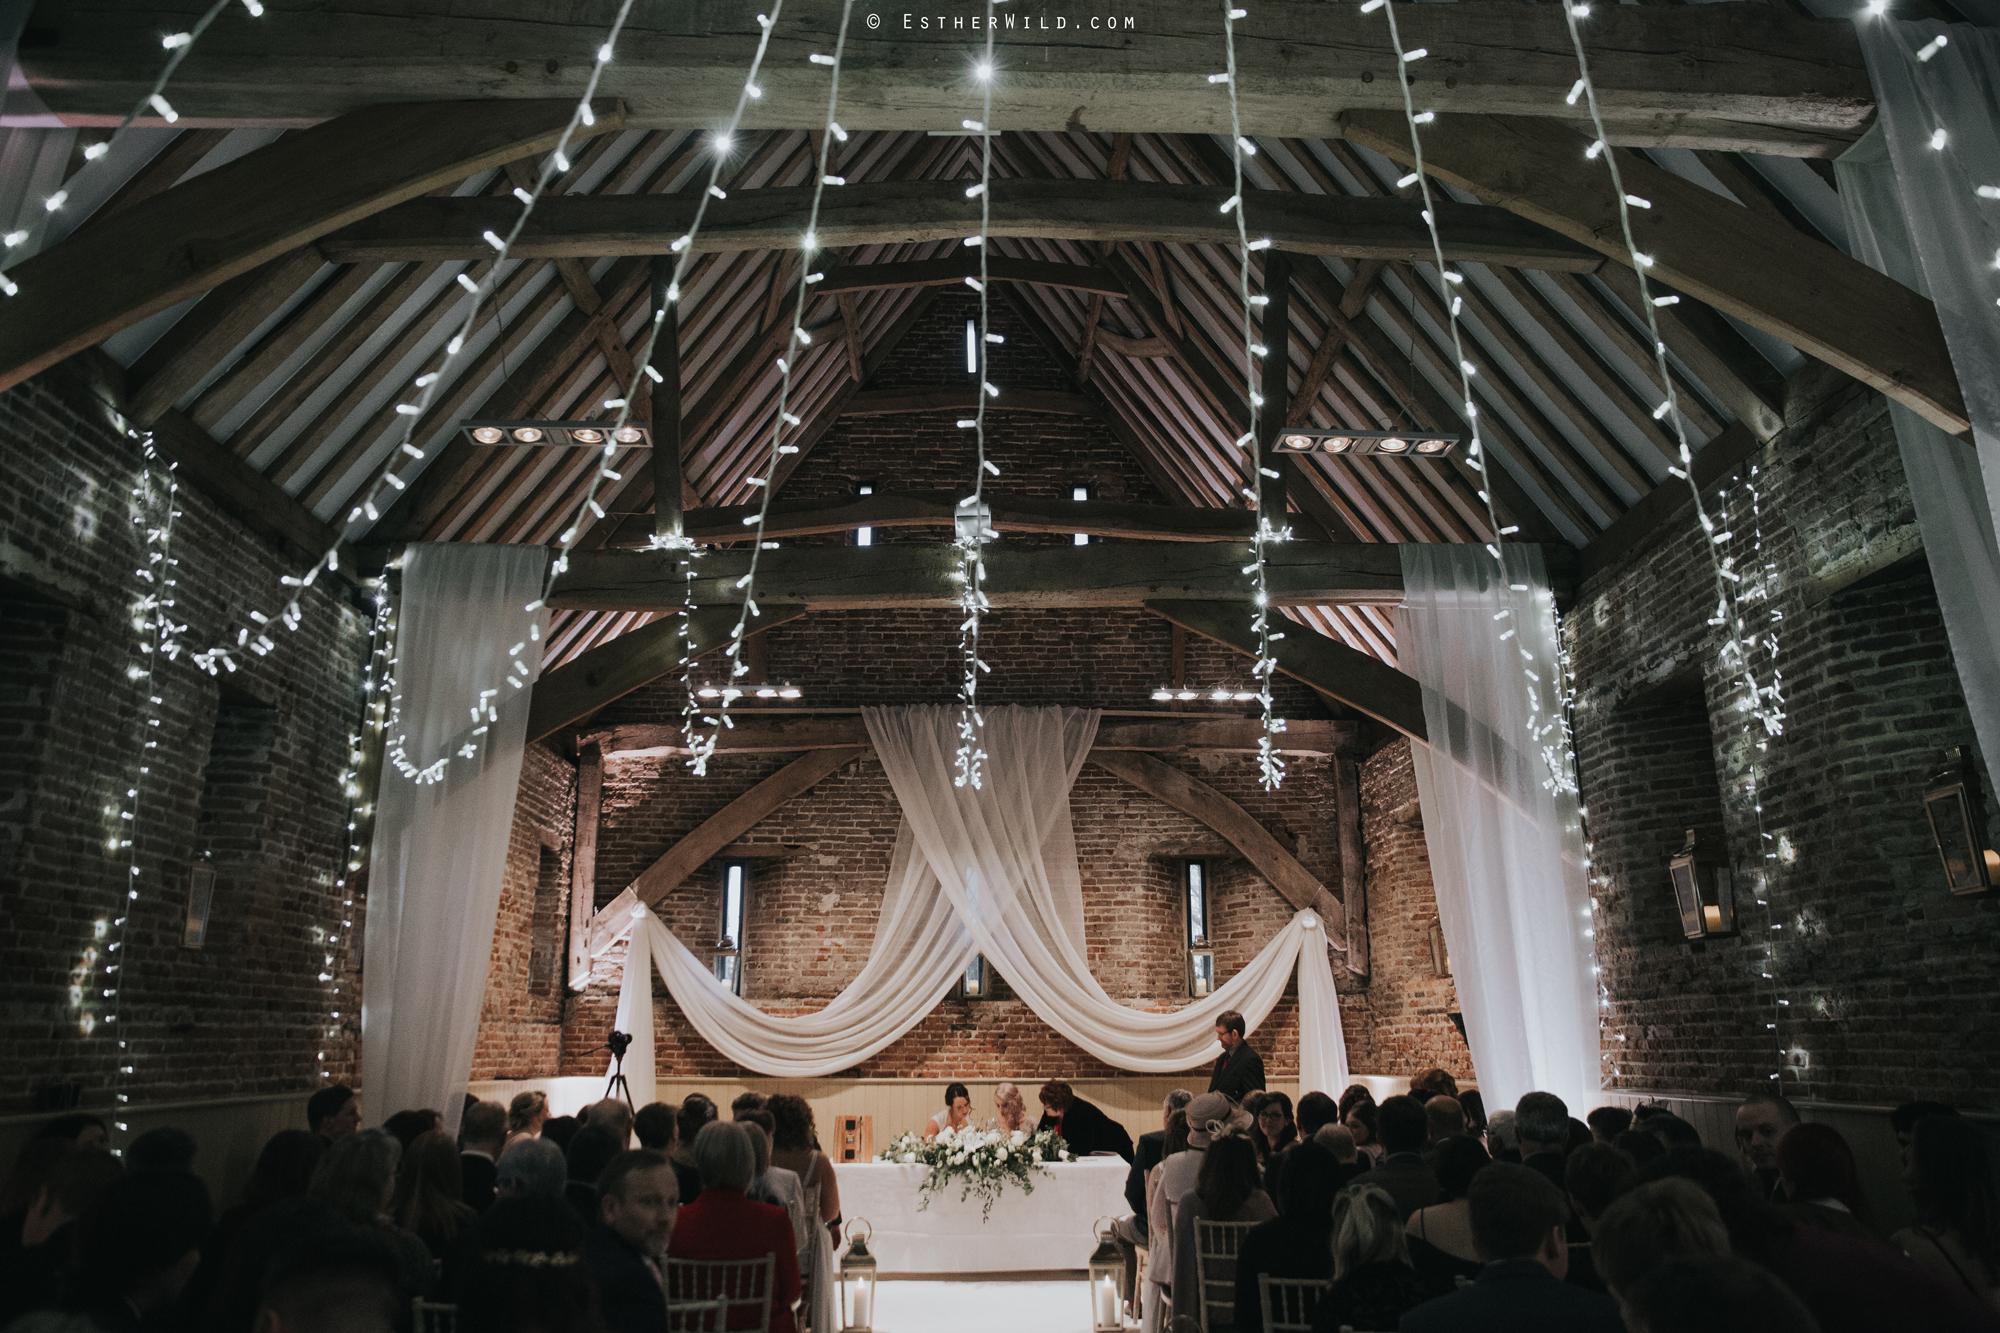 Elms_Barn_Weddings_Suffolk_Photographer_Copyright_Esther_Wild_IMG_1294.jpg